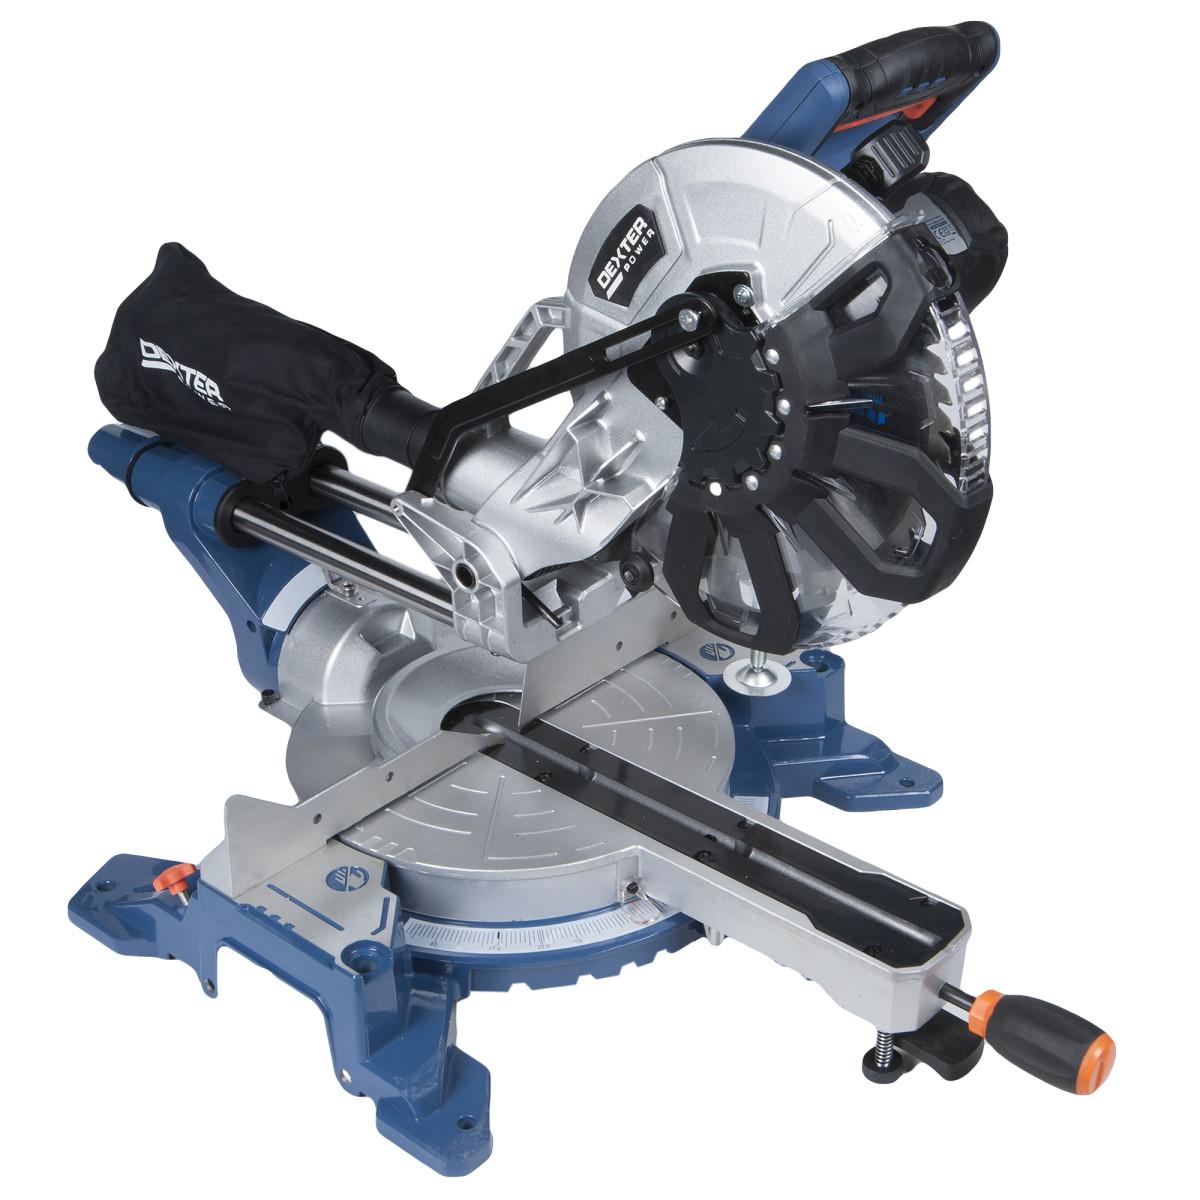 Пила торцовочная Dexter PowerJ1G‐ZP28‐255A 2000 Вт 255х30 мм